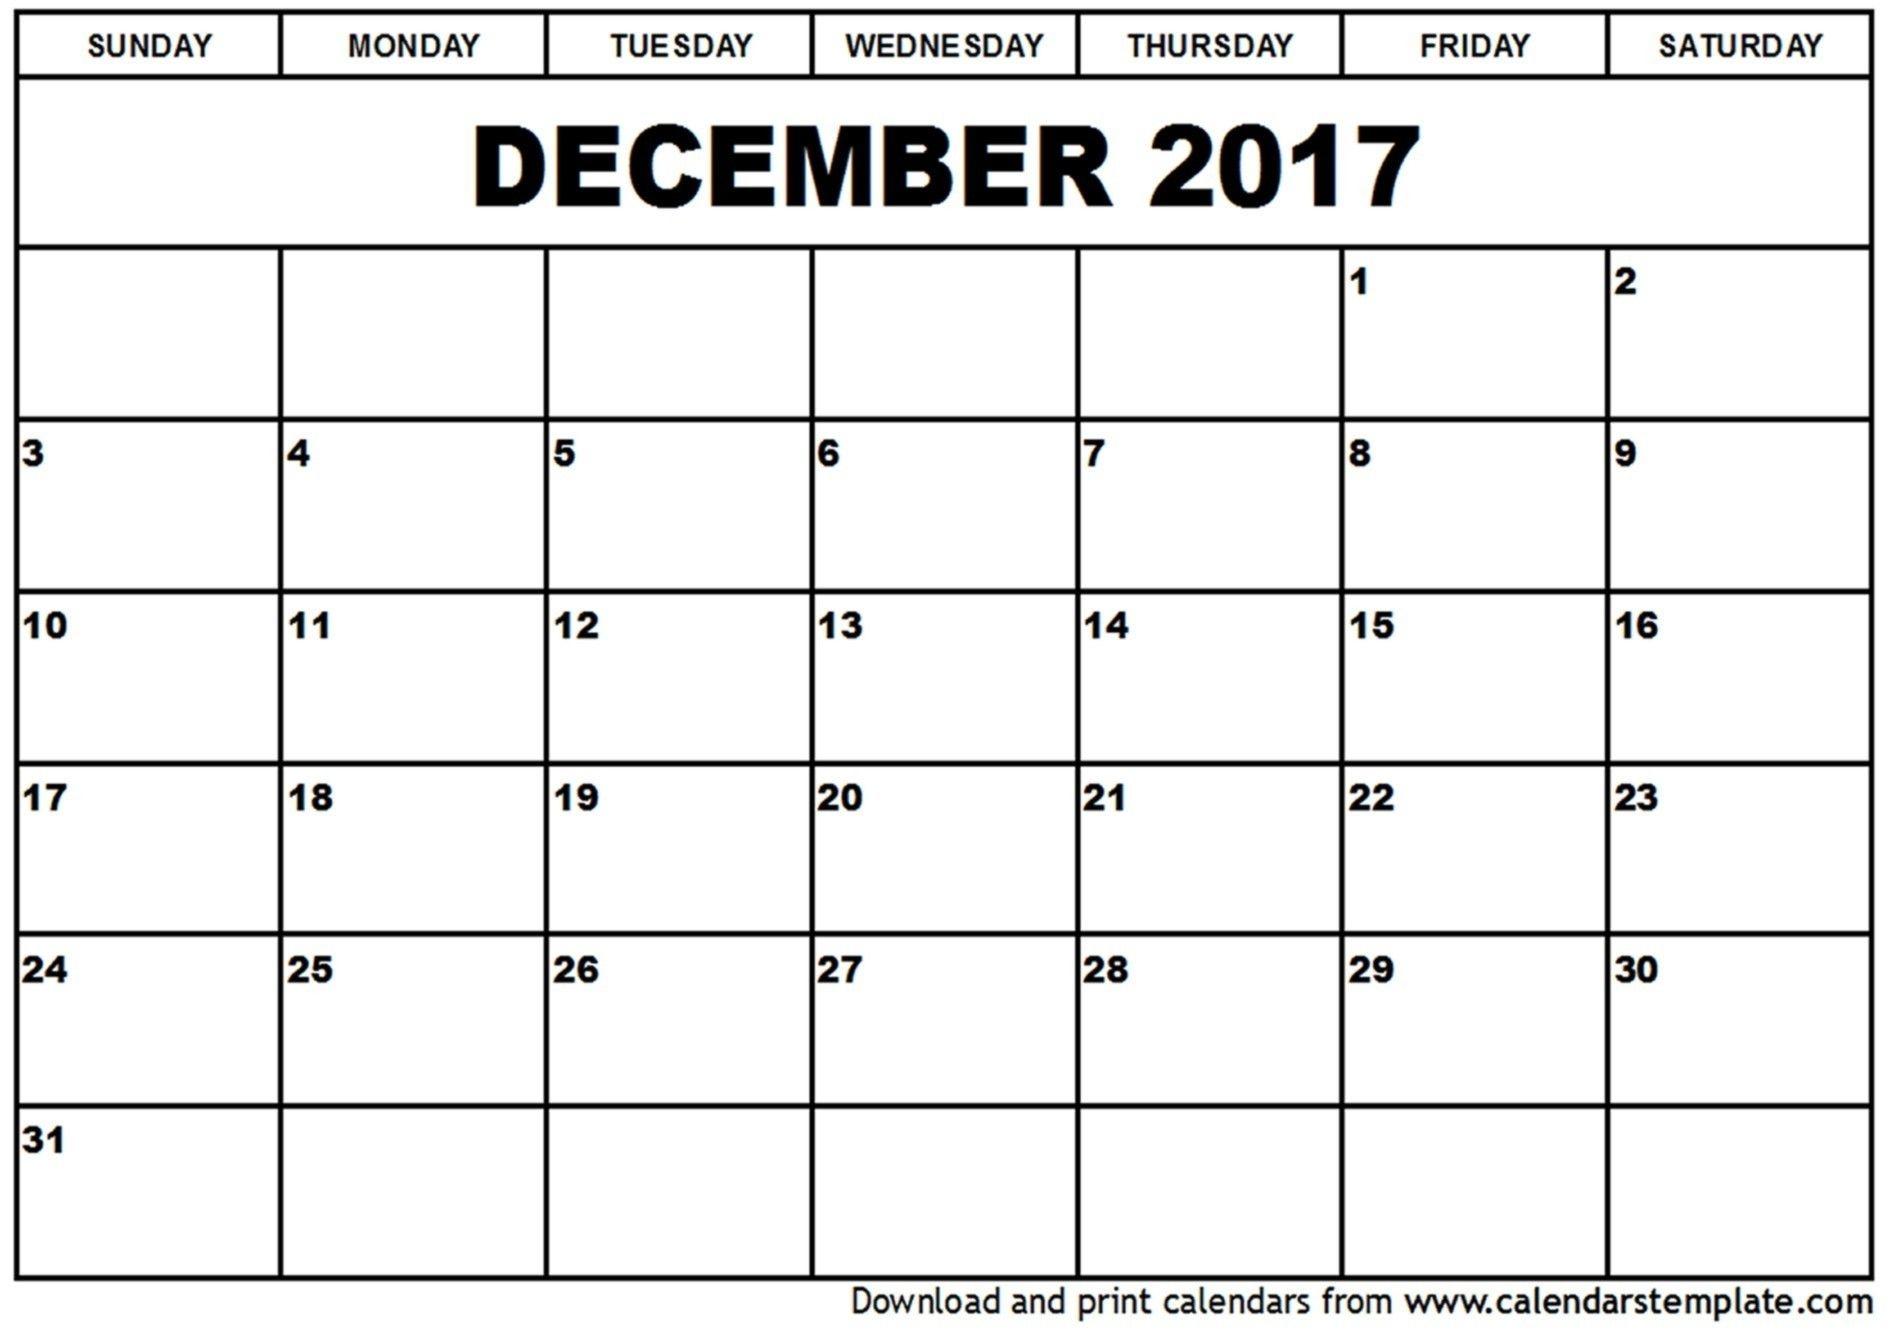 Free Printable Calendar I Can Type In | Ten Free Printable